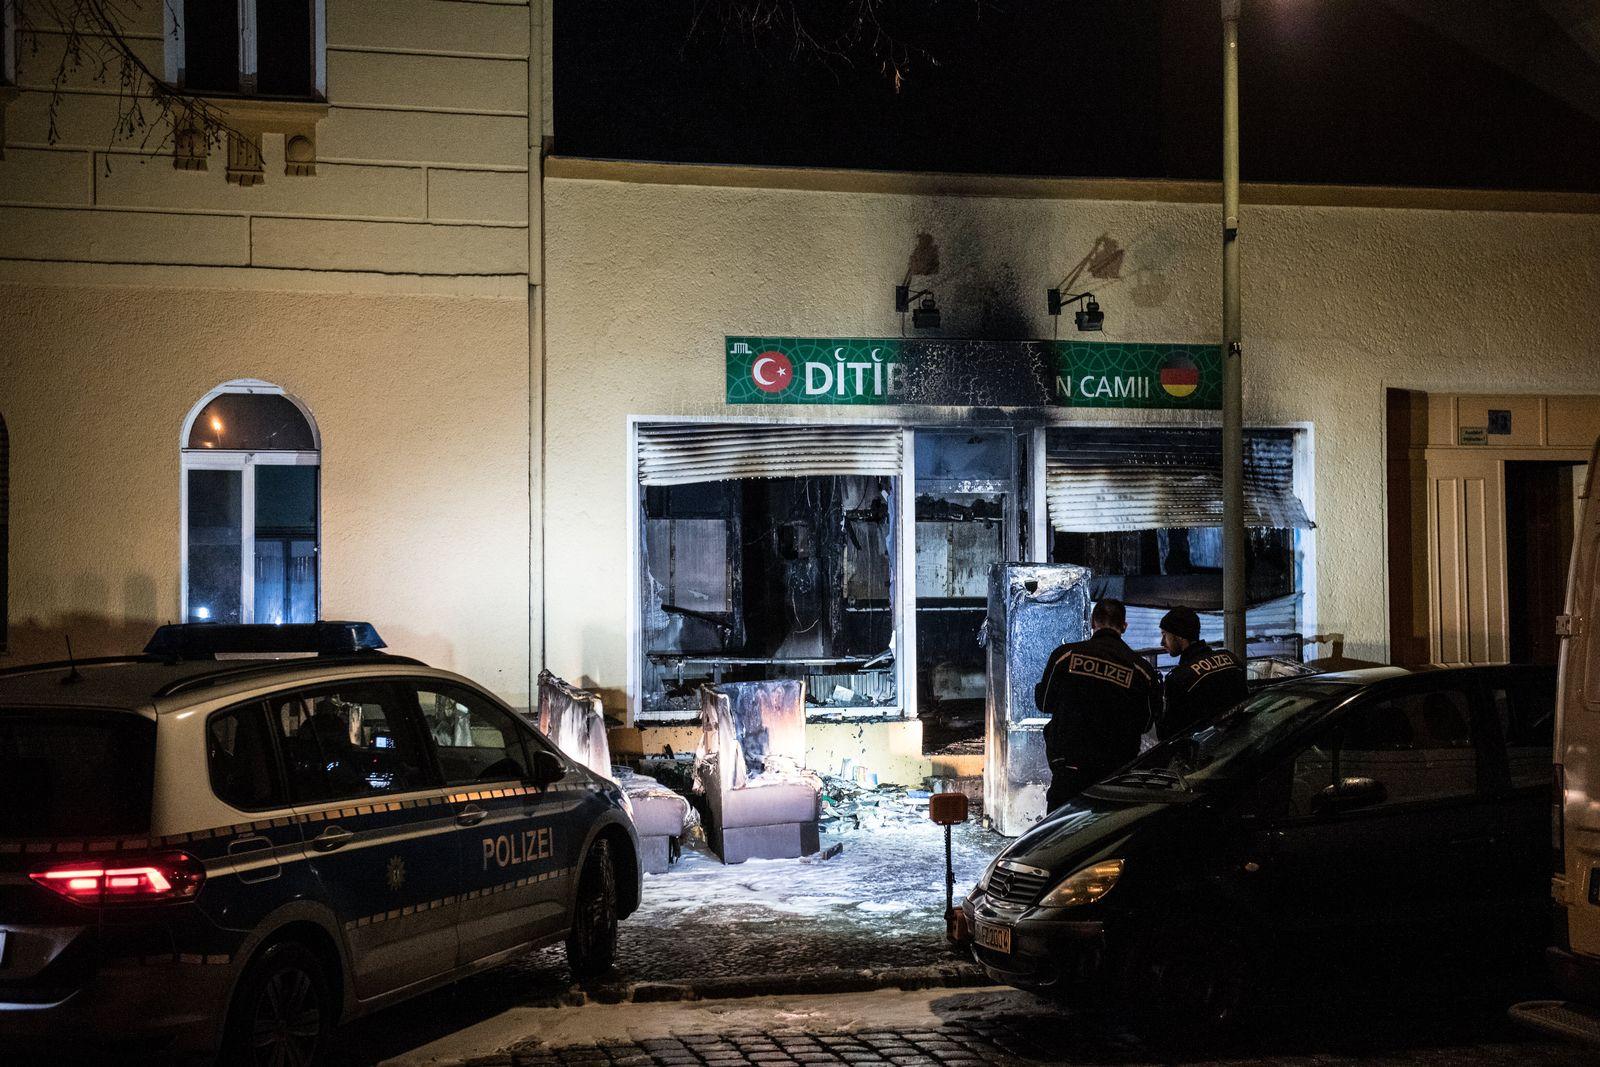 Ditib/ Brand/ Berliner Moschee